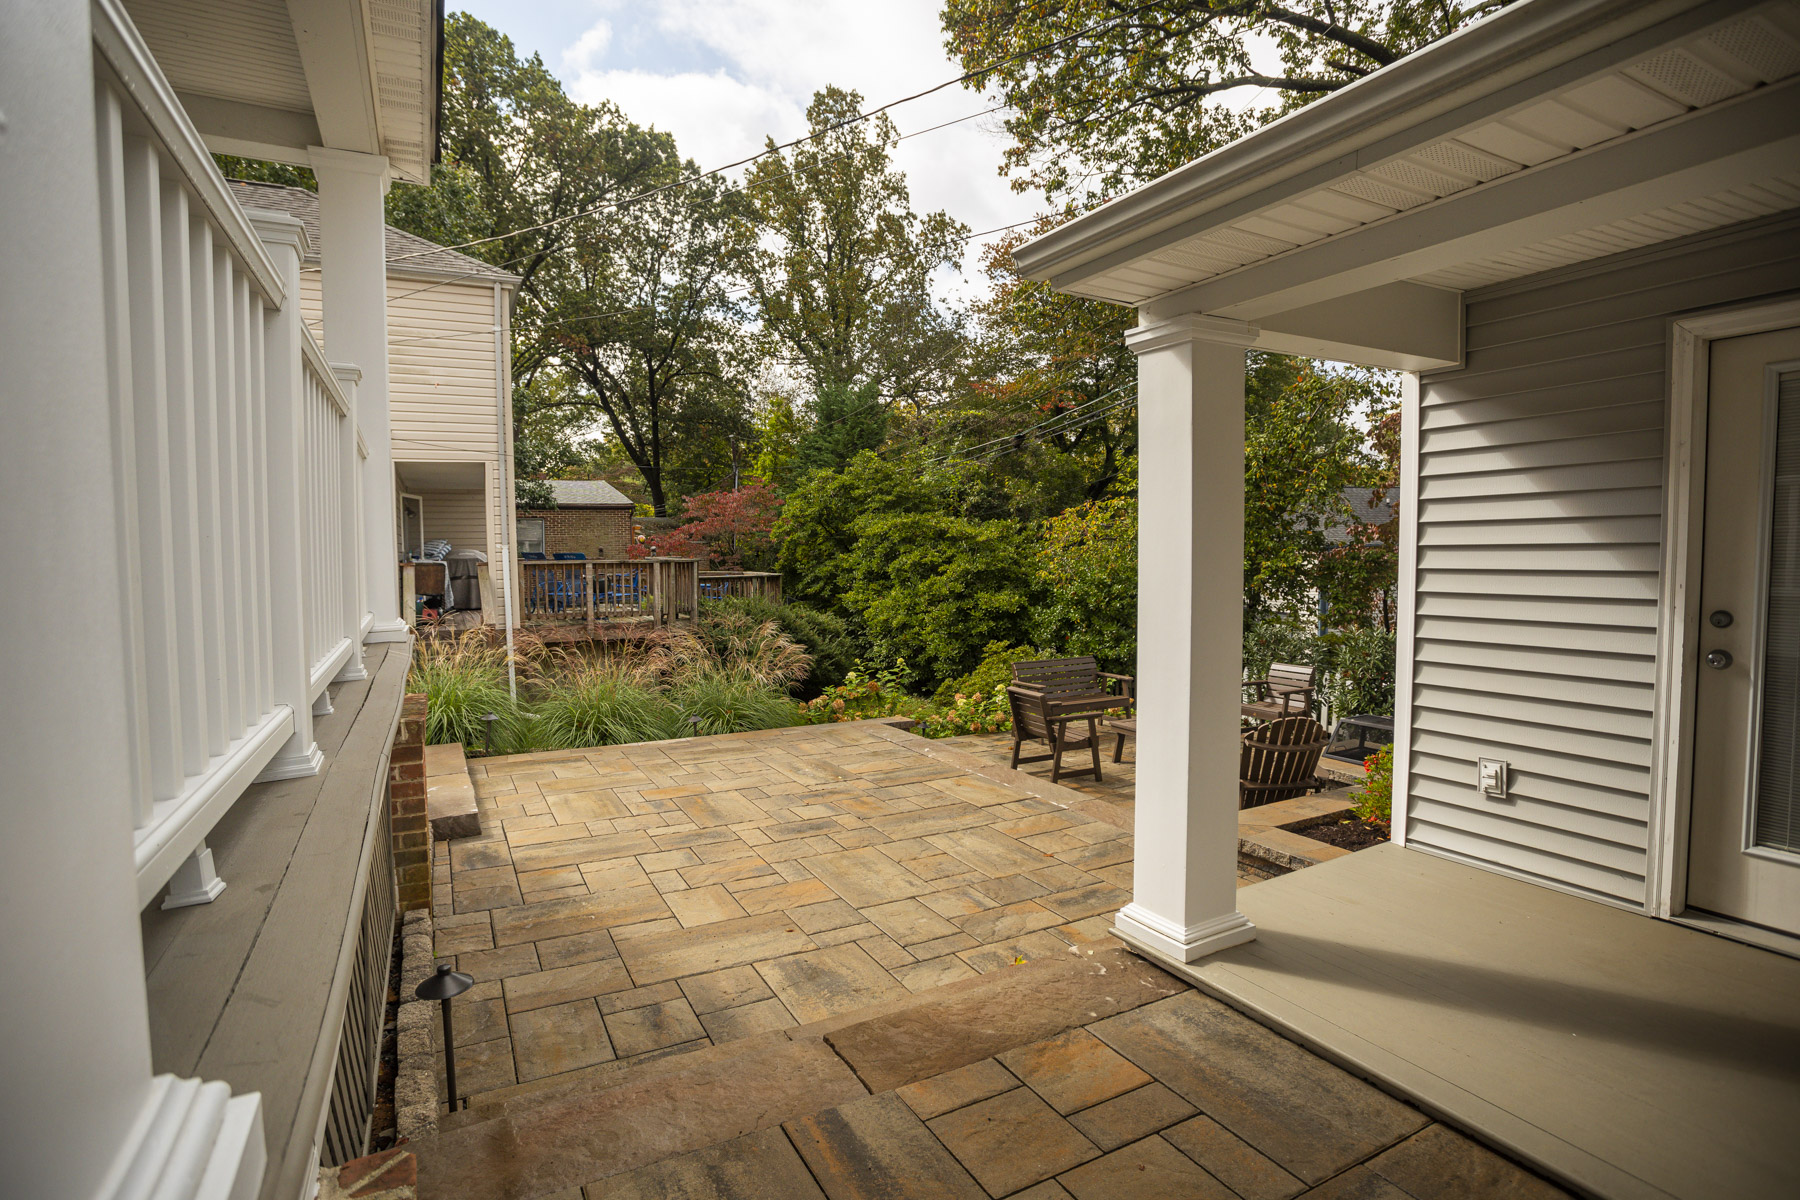 Paver patio and landscape transformation